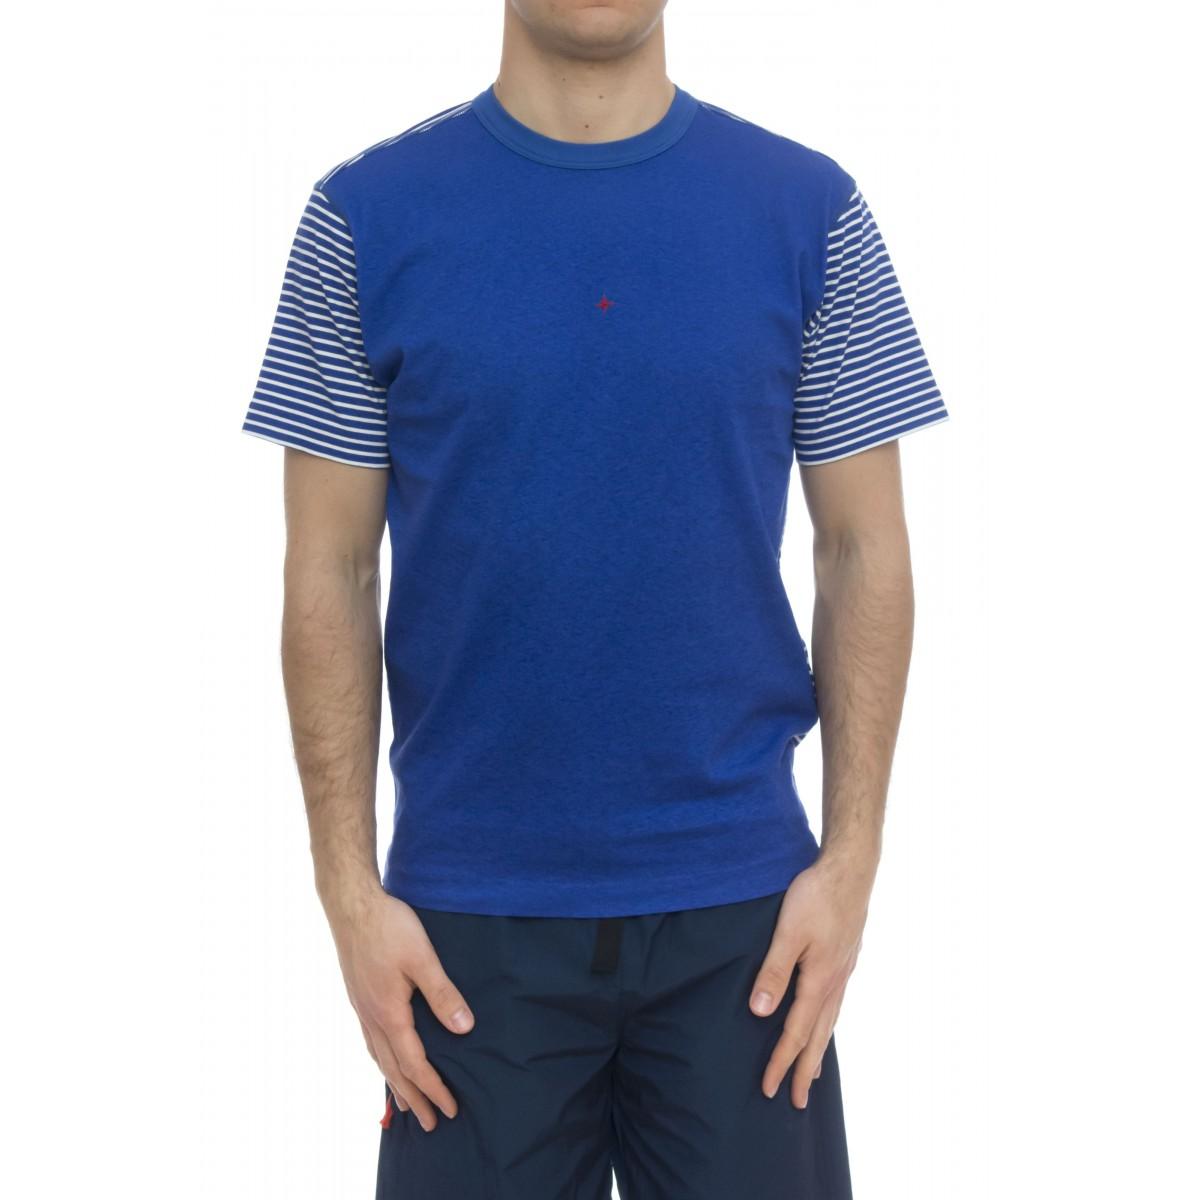 T-shirt uomo - 233x3 t-shirt marina